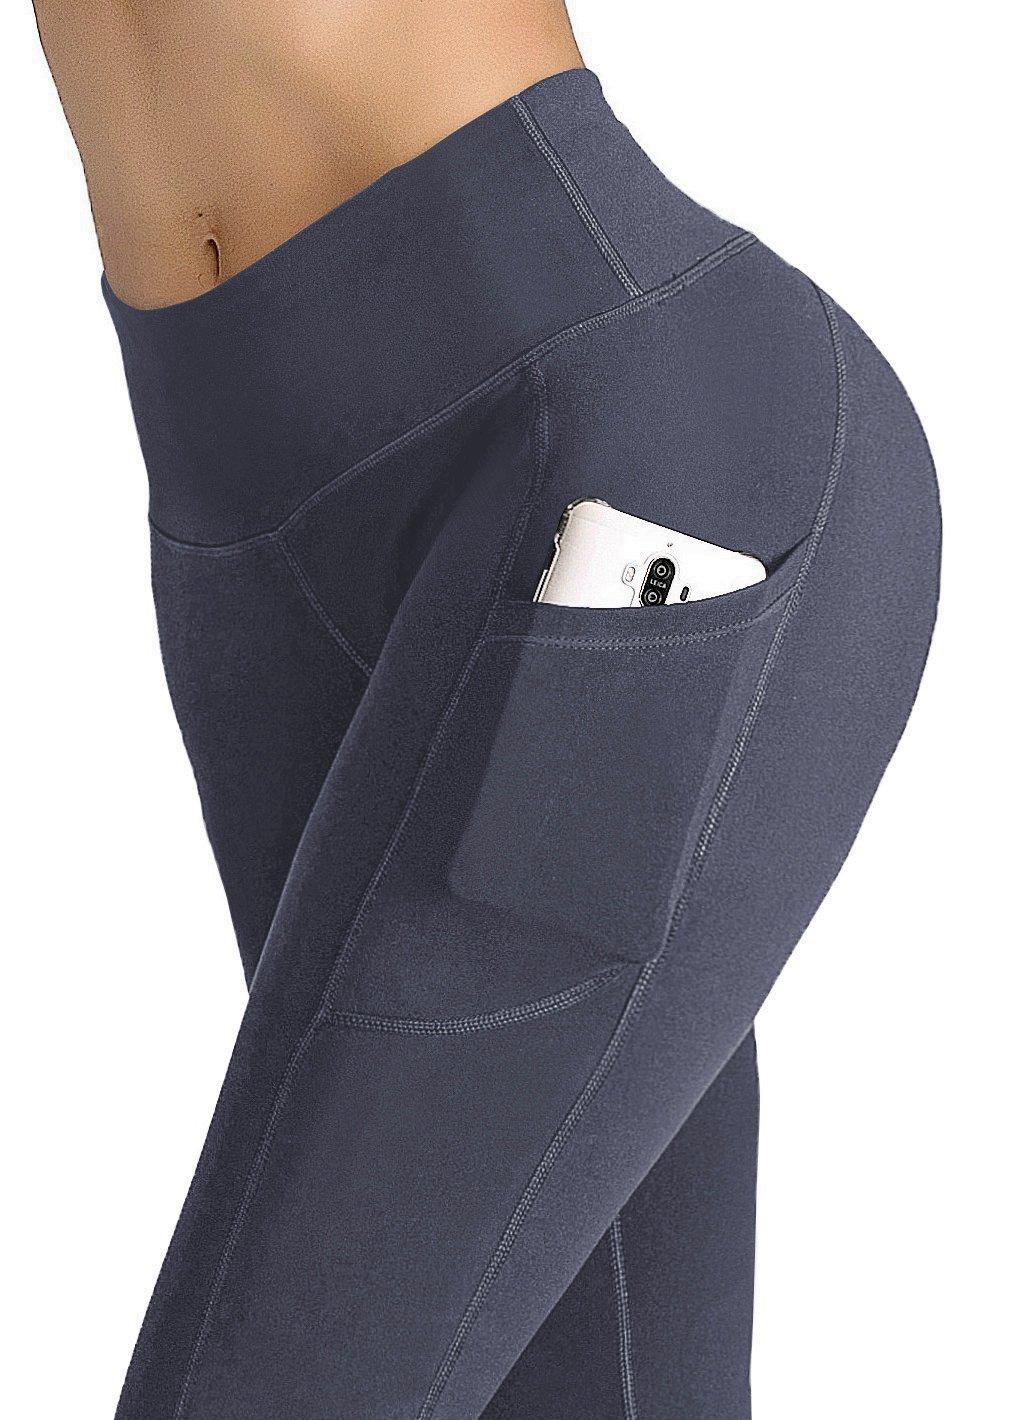 IUGA Pants US 7840 HUI Small by IUGA (Image #5)